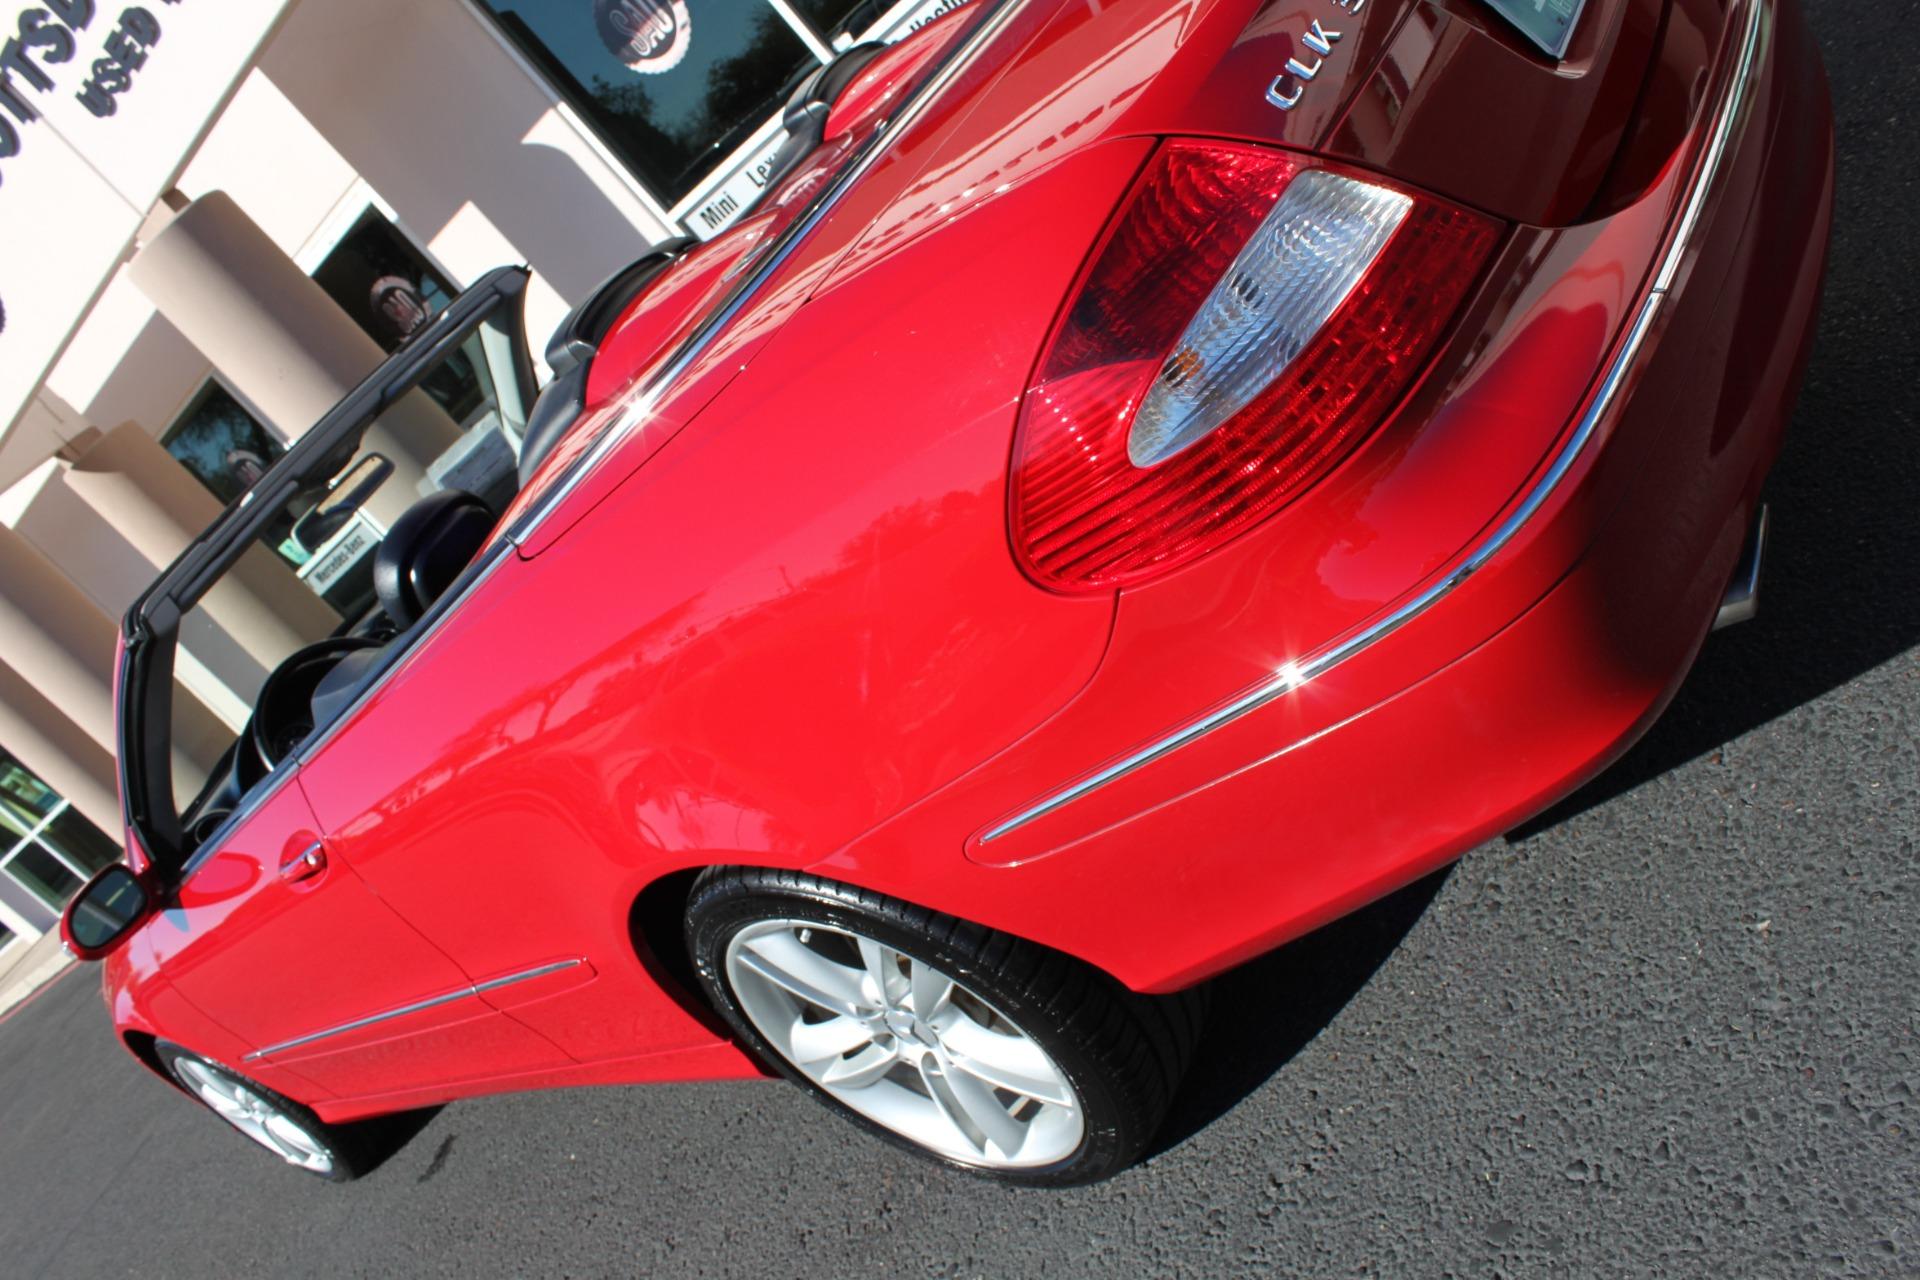 Used-2006-Mercedes-Benz-CLK-Class-Convertible-35L-4X4